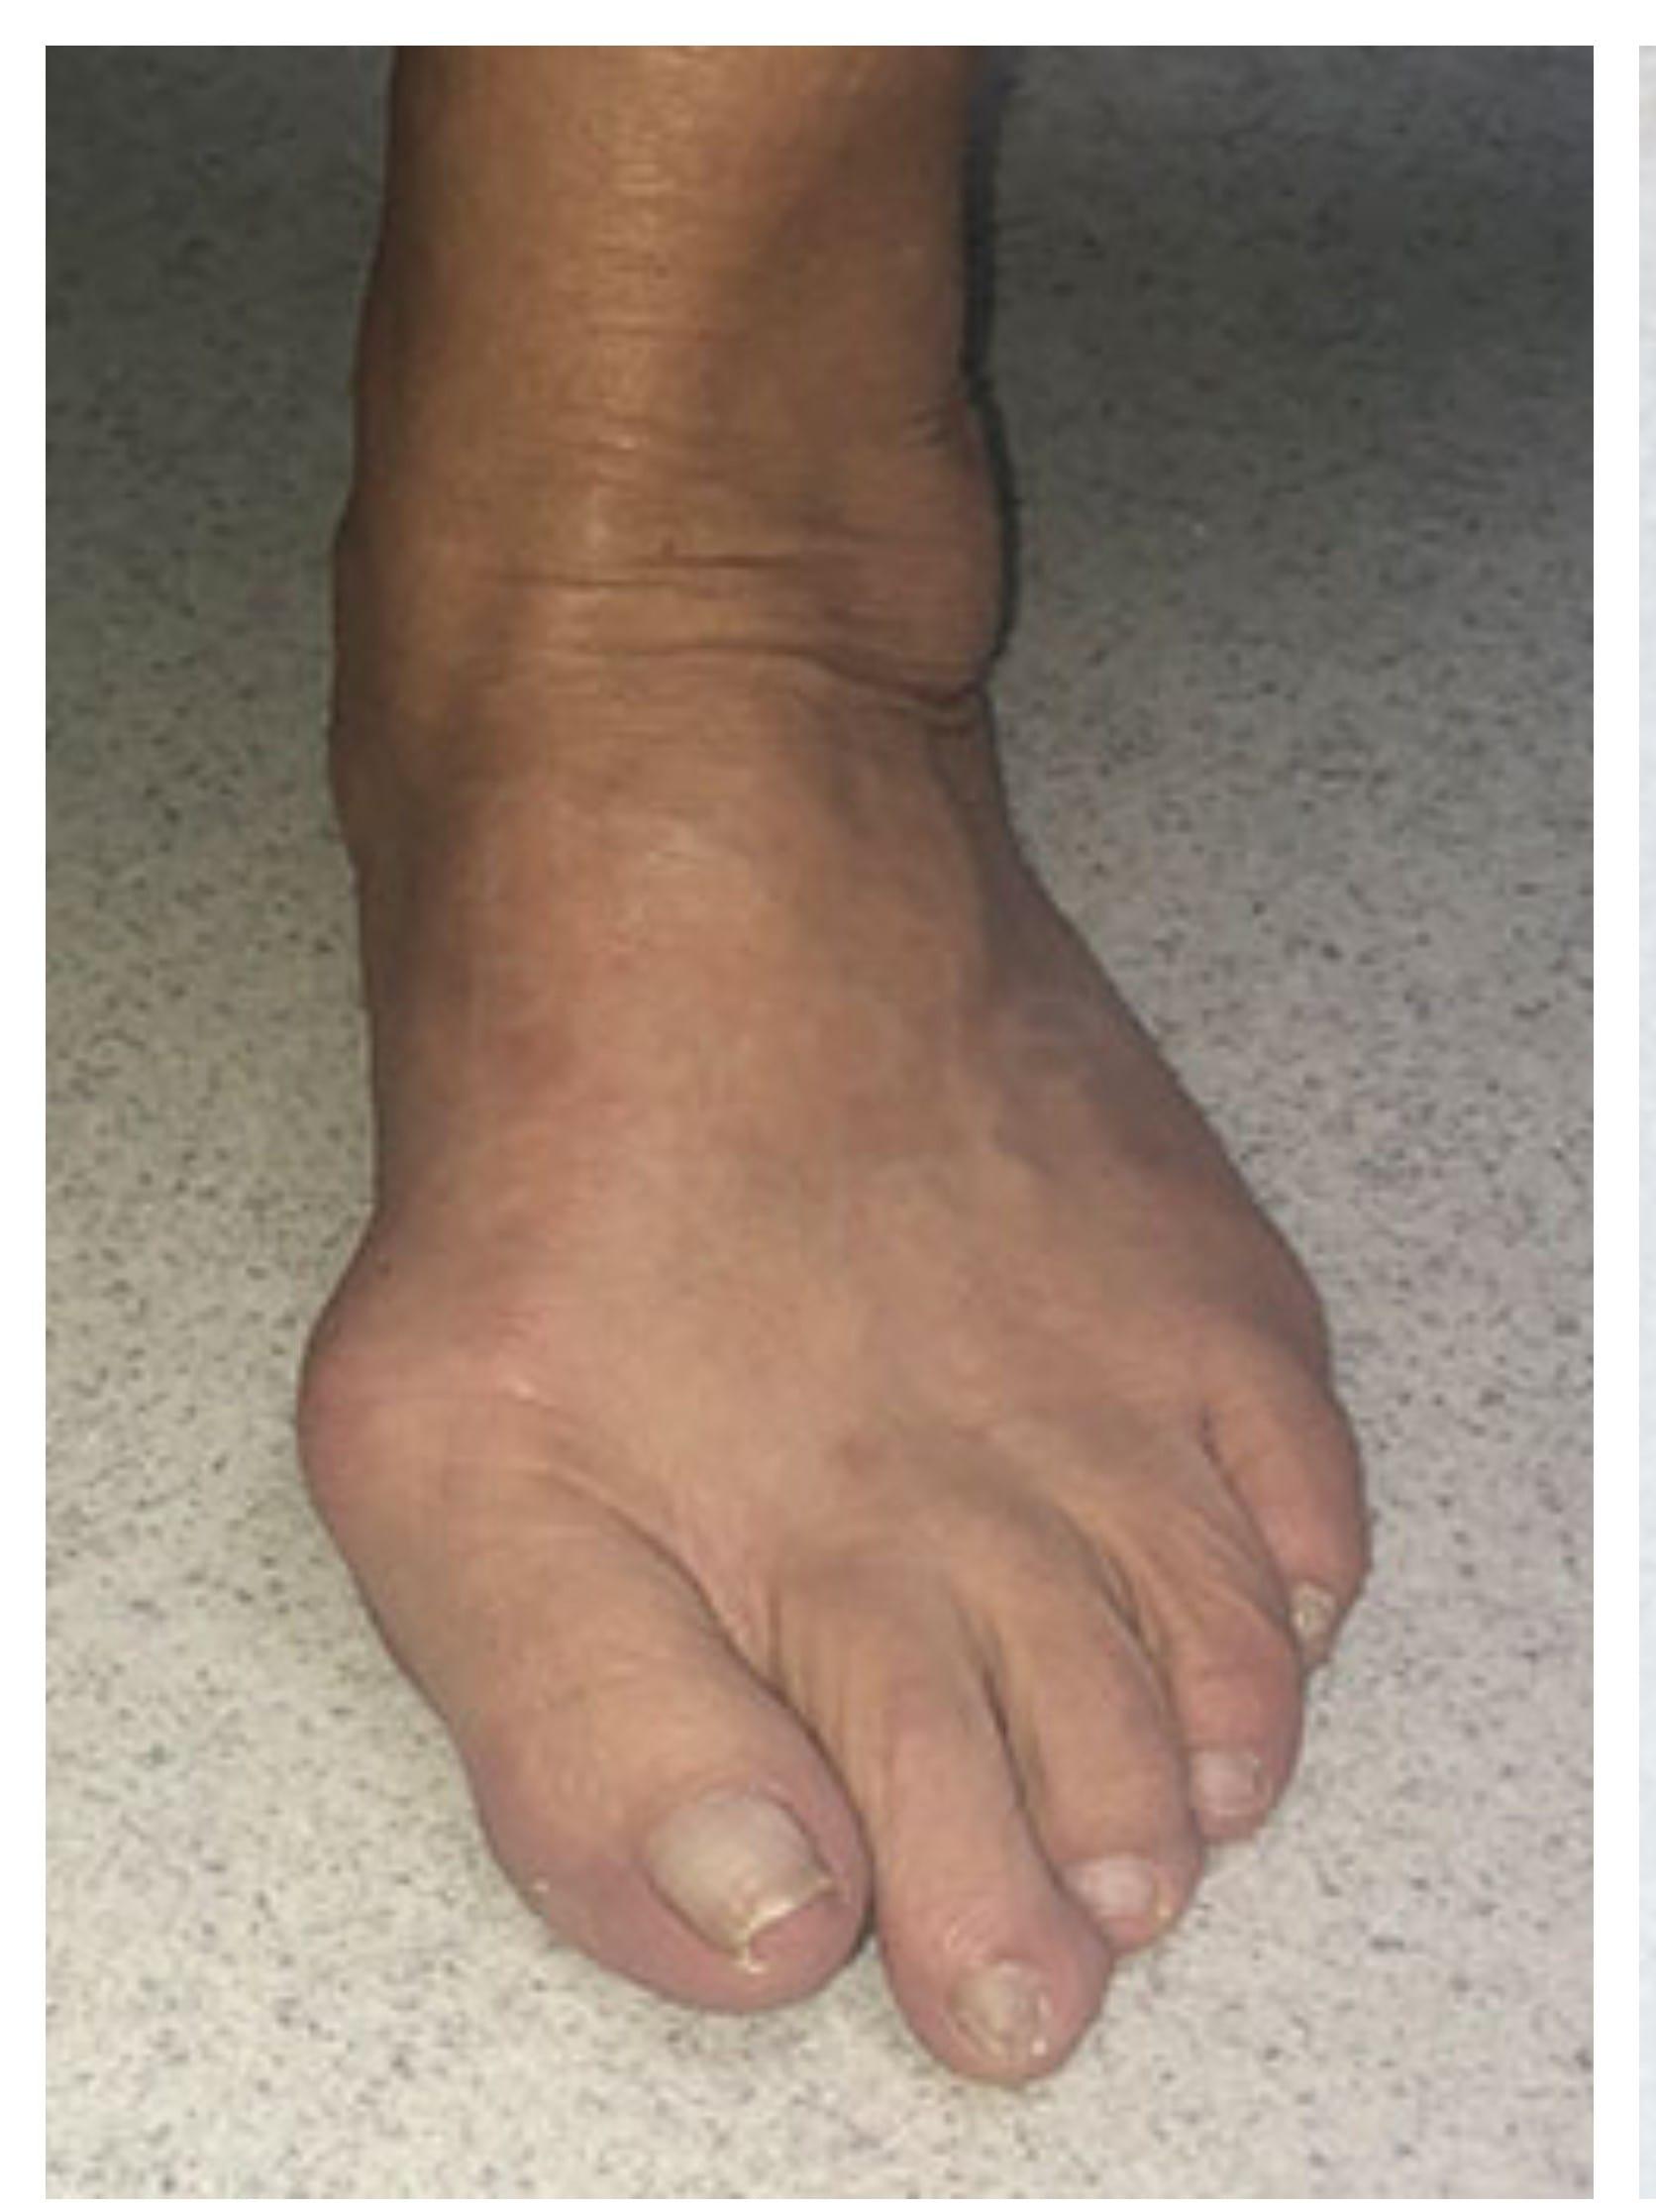 Bunions Treatment Before Minimally Invasive Surgery